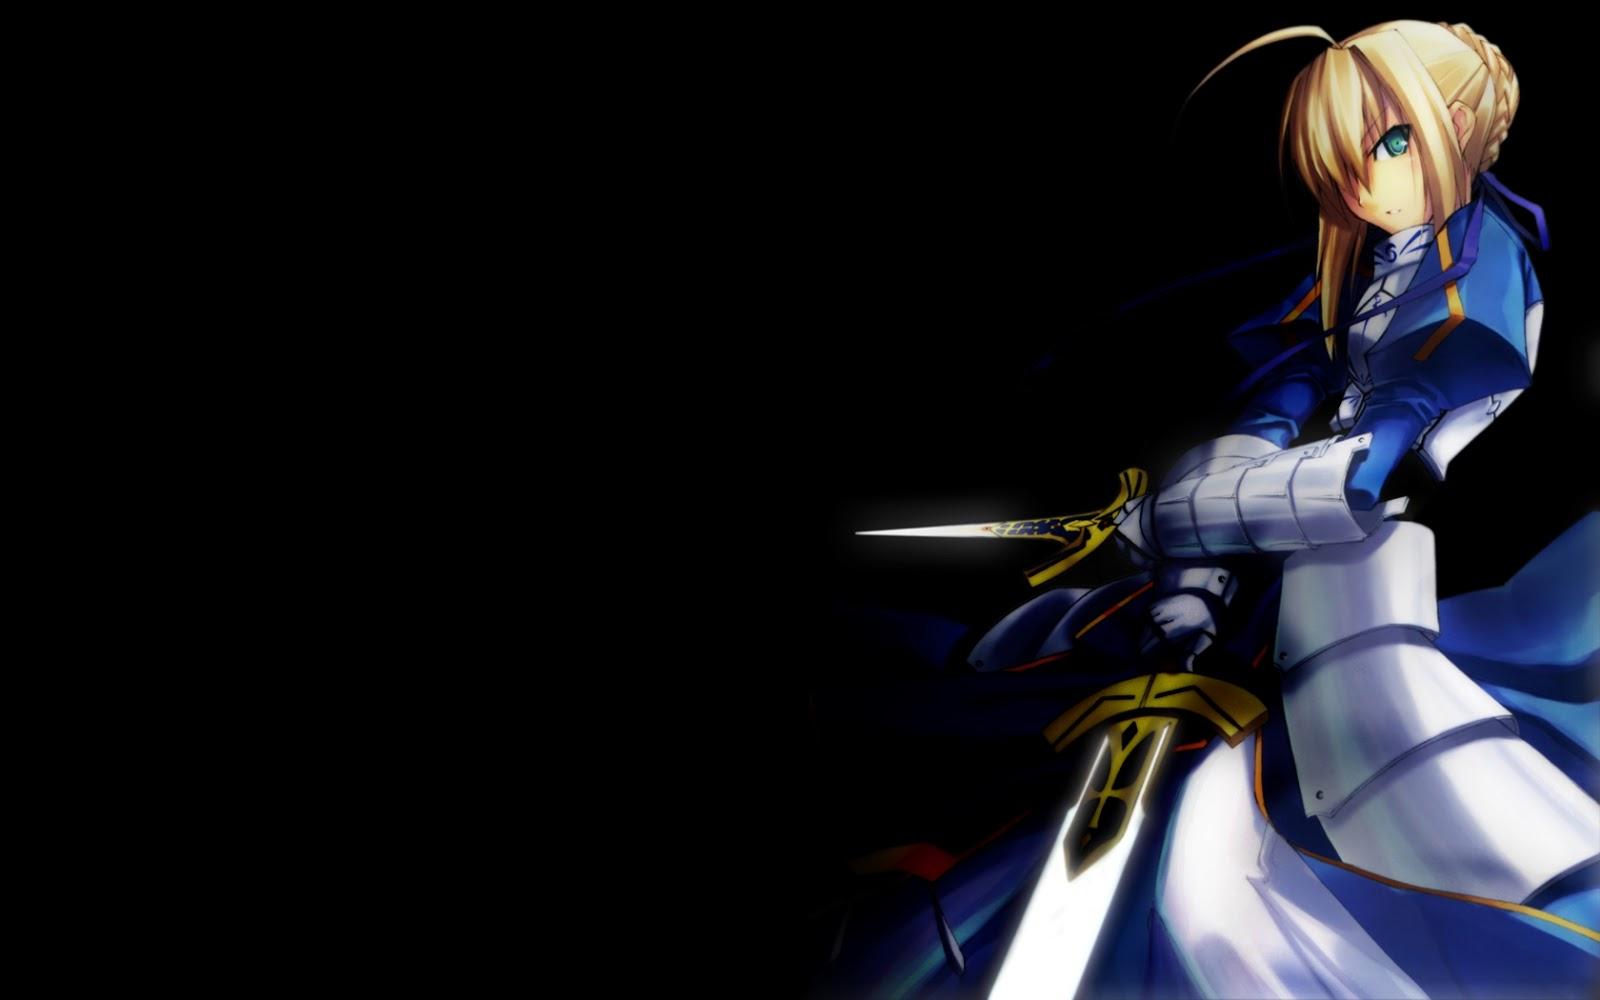 Fate Zero Saber Fate StayNight Anime Girl Sword Armor HD Wallpaper 1600x1000